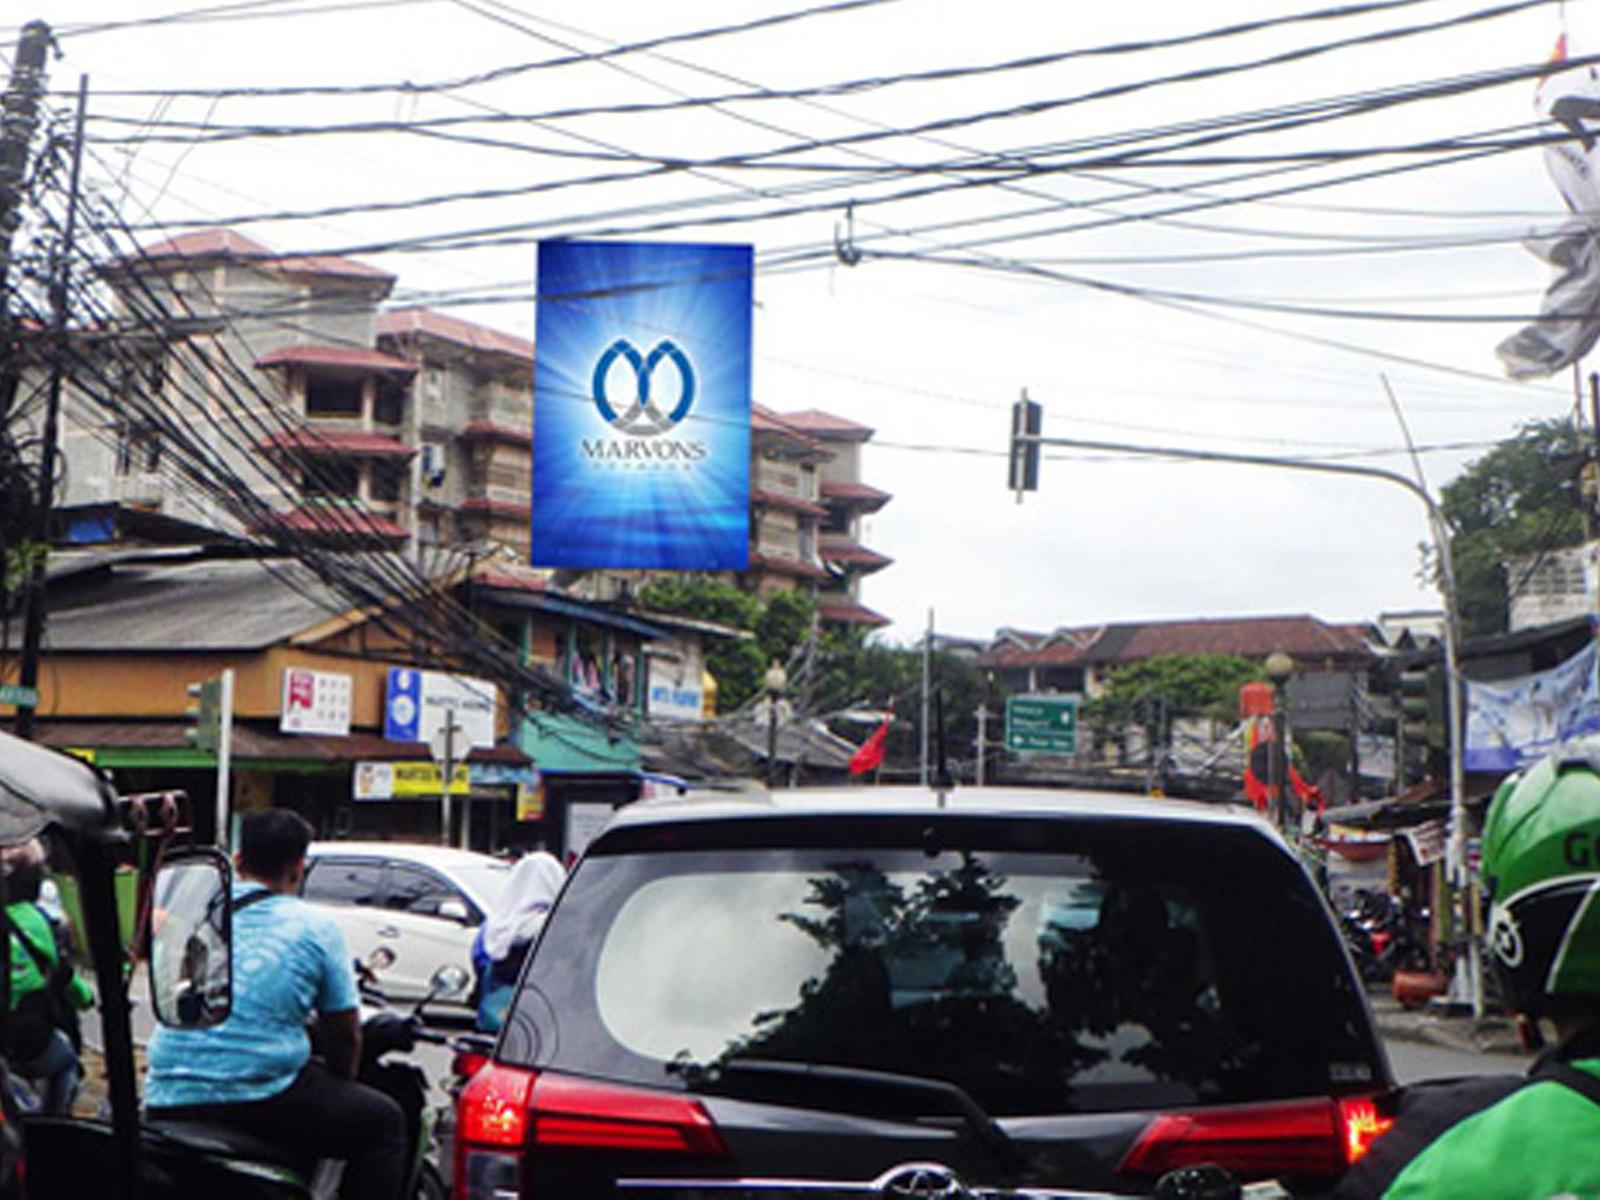 Keputusan Tepat Beriklan di Billboard Tebet (Warteg Warmo) Jakarta Selatan